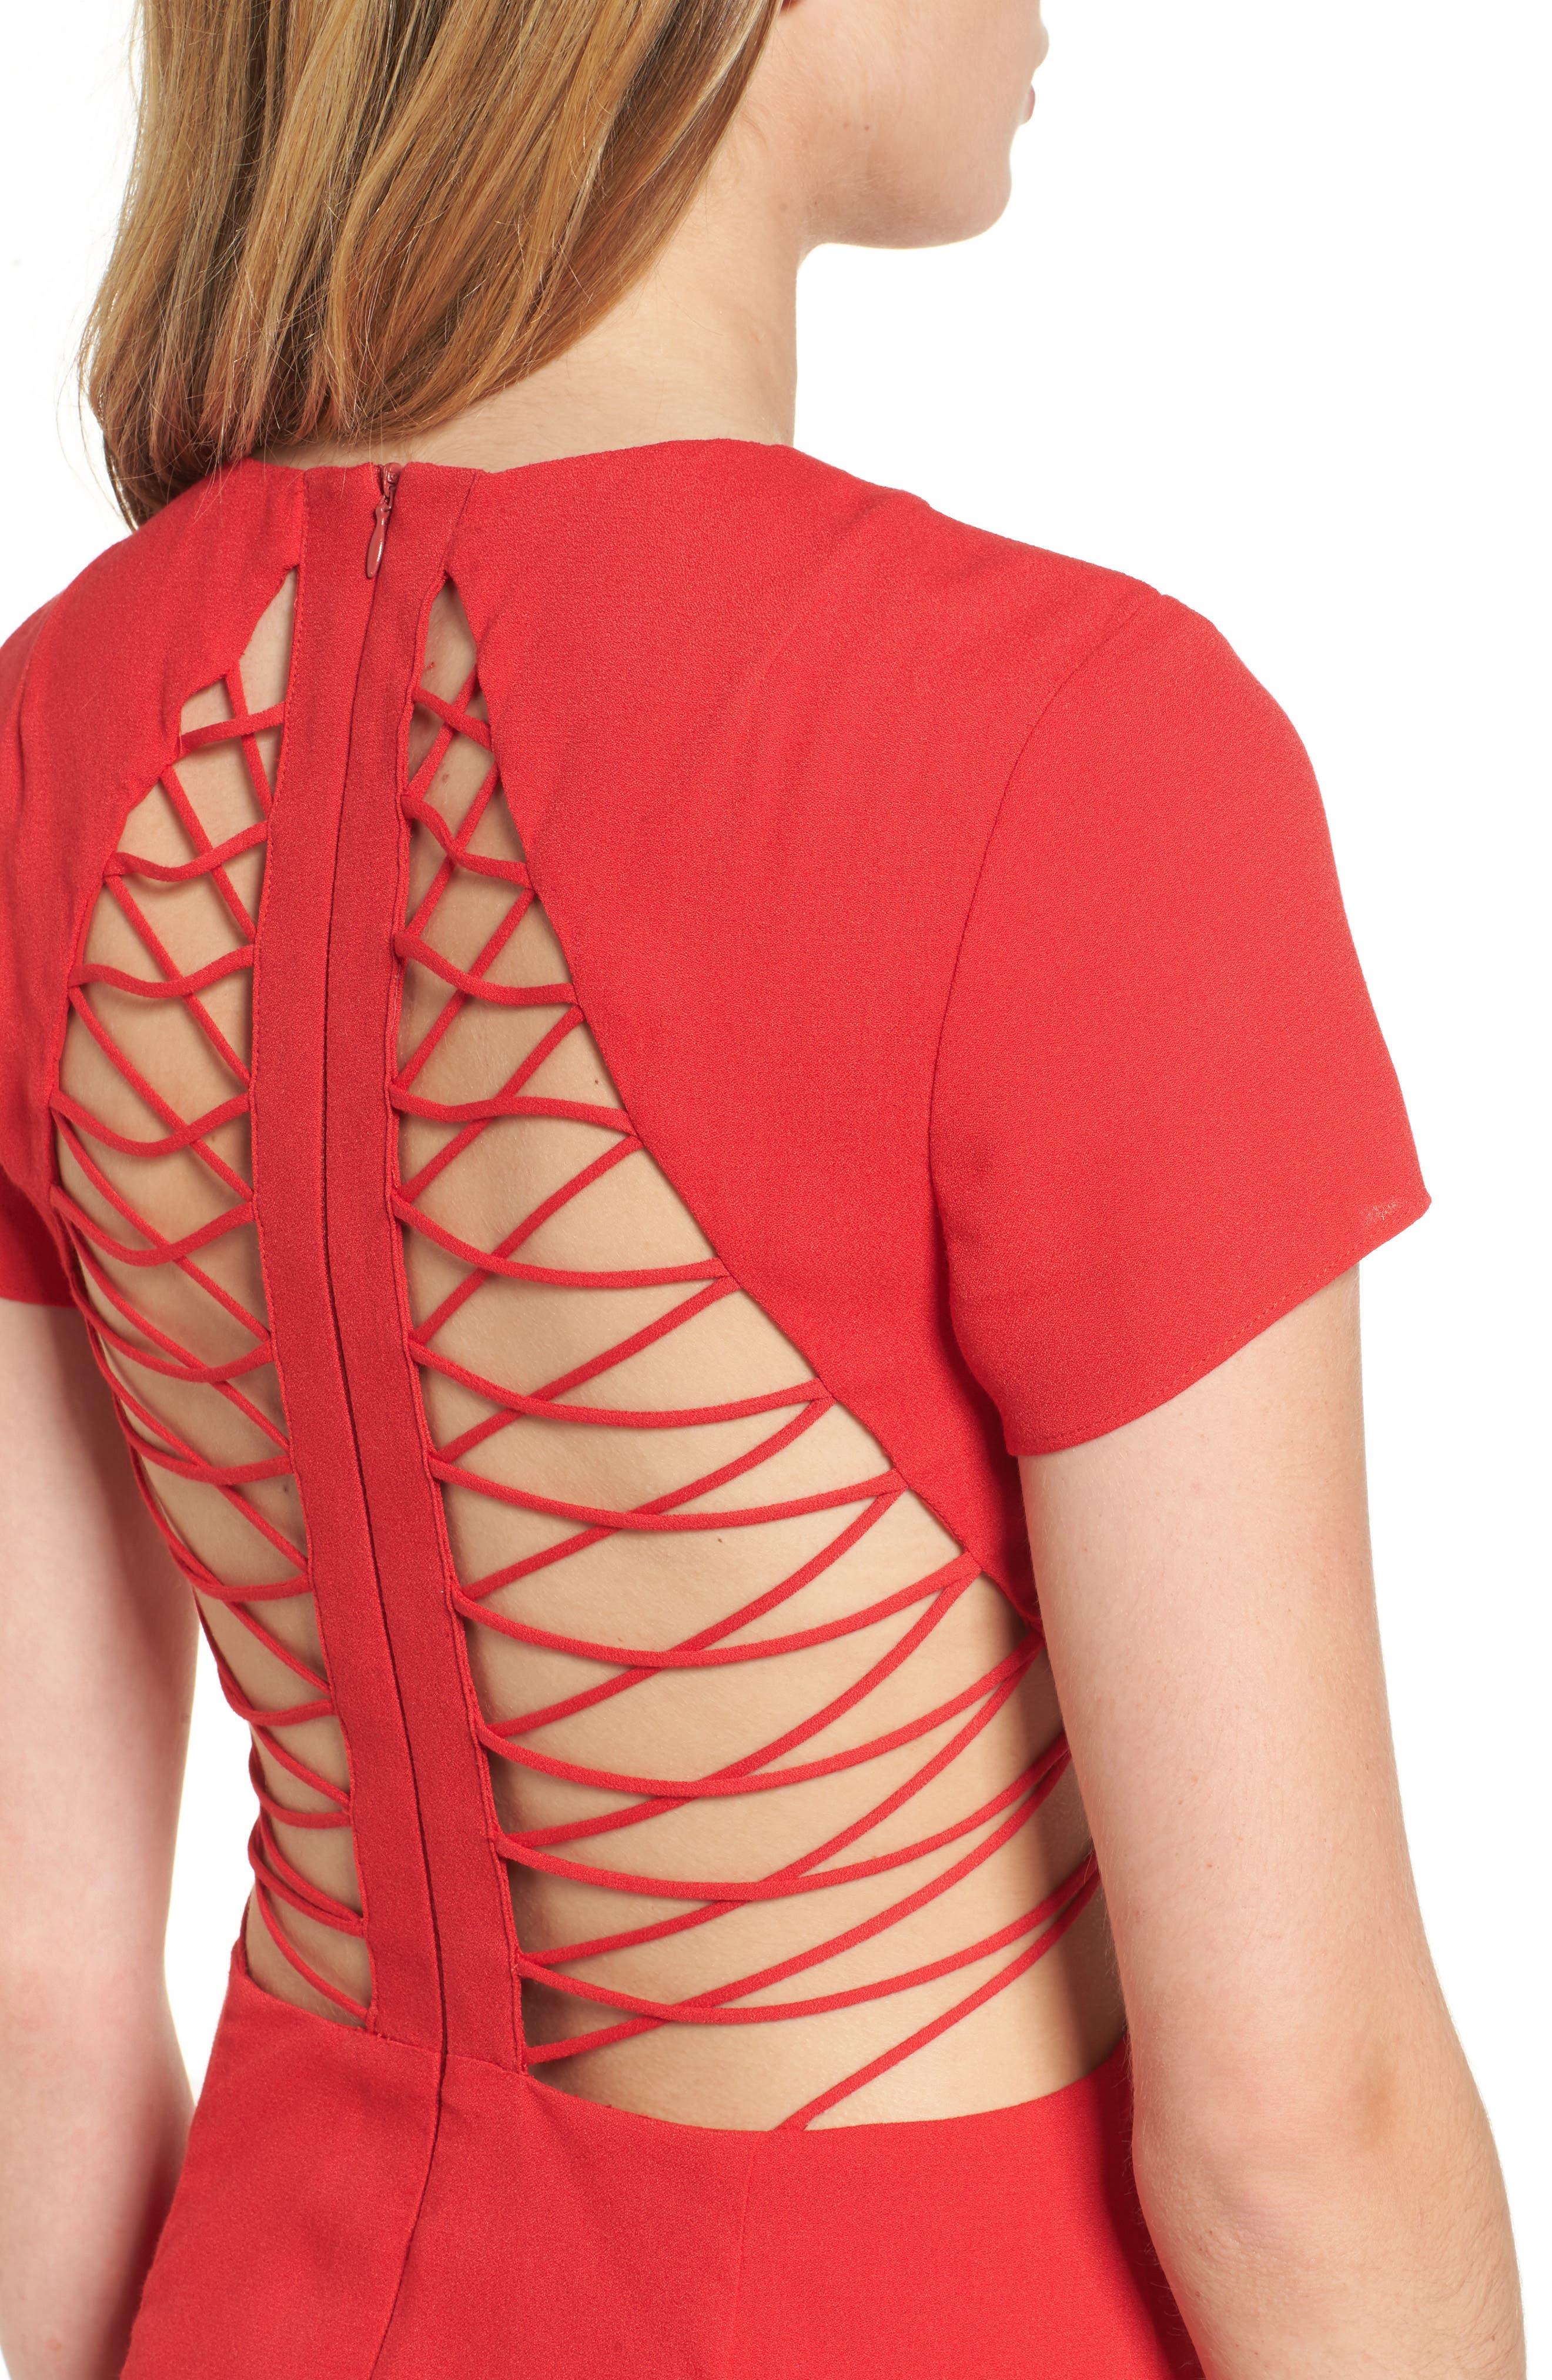 Chelsea Lattice Back Fit & Flare Dress,                             Alternate thumbnail 4, color,                             Red